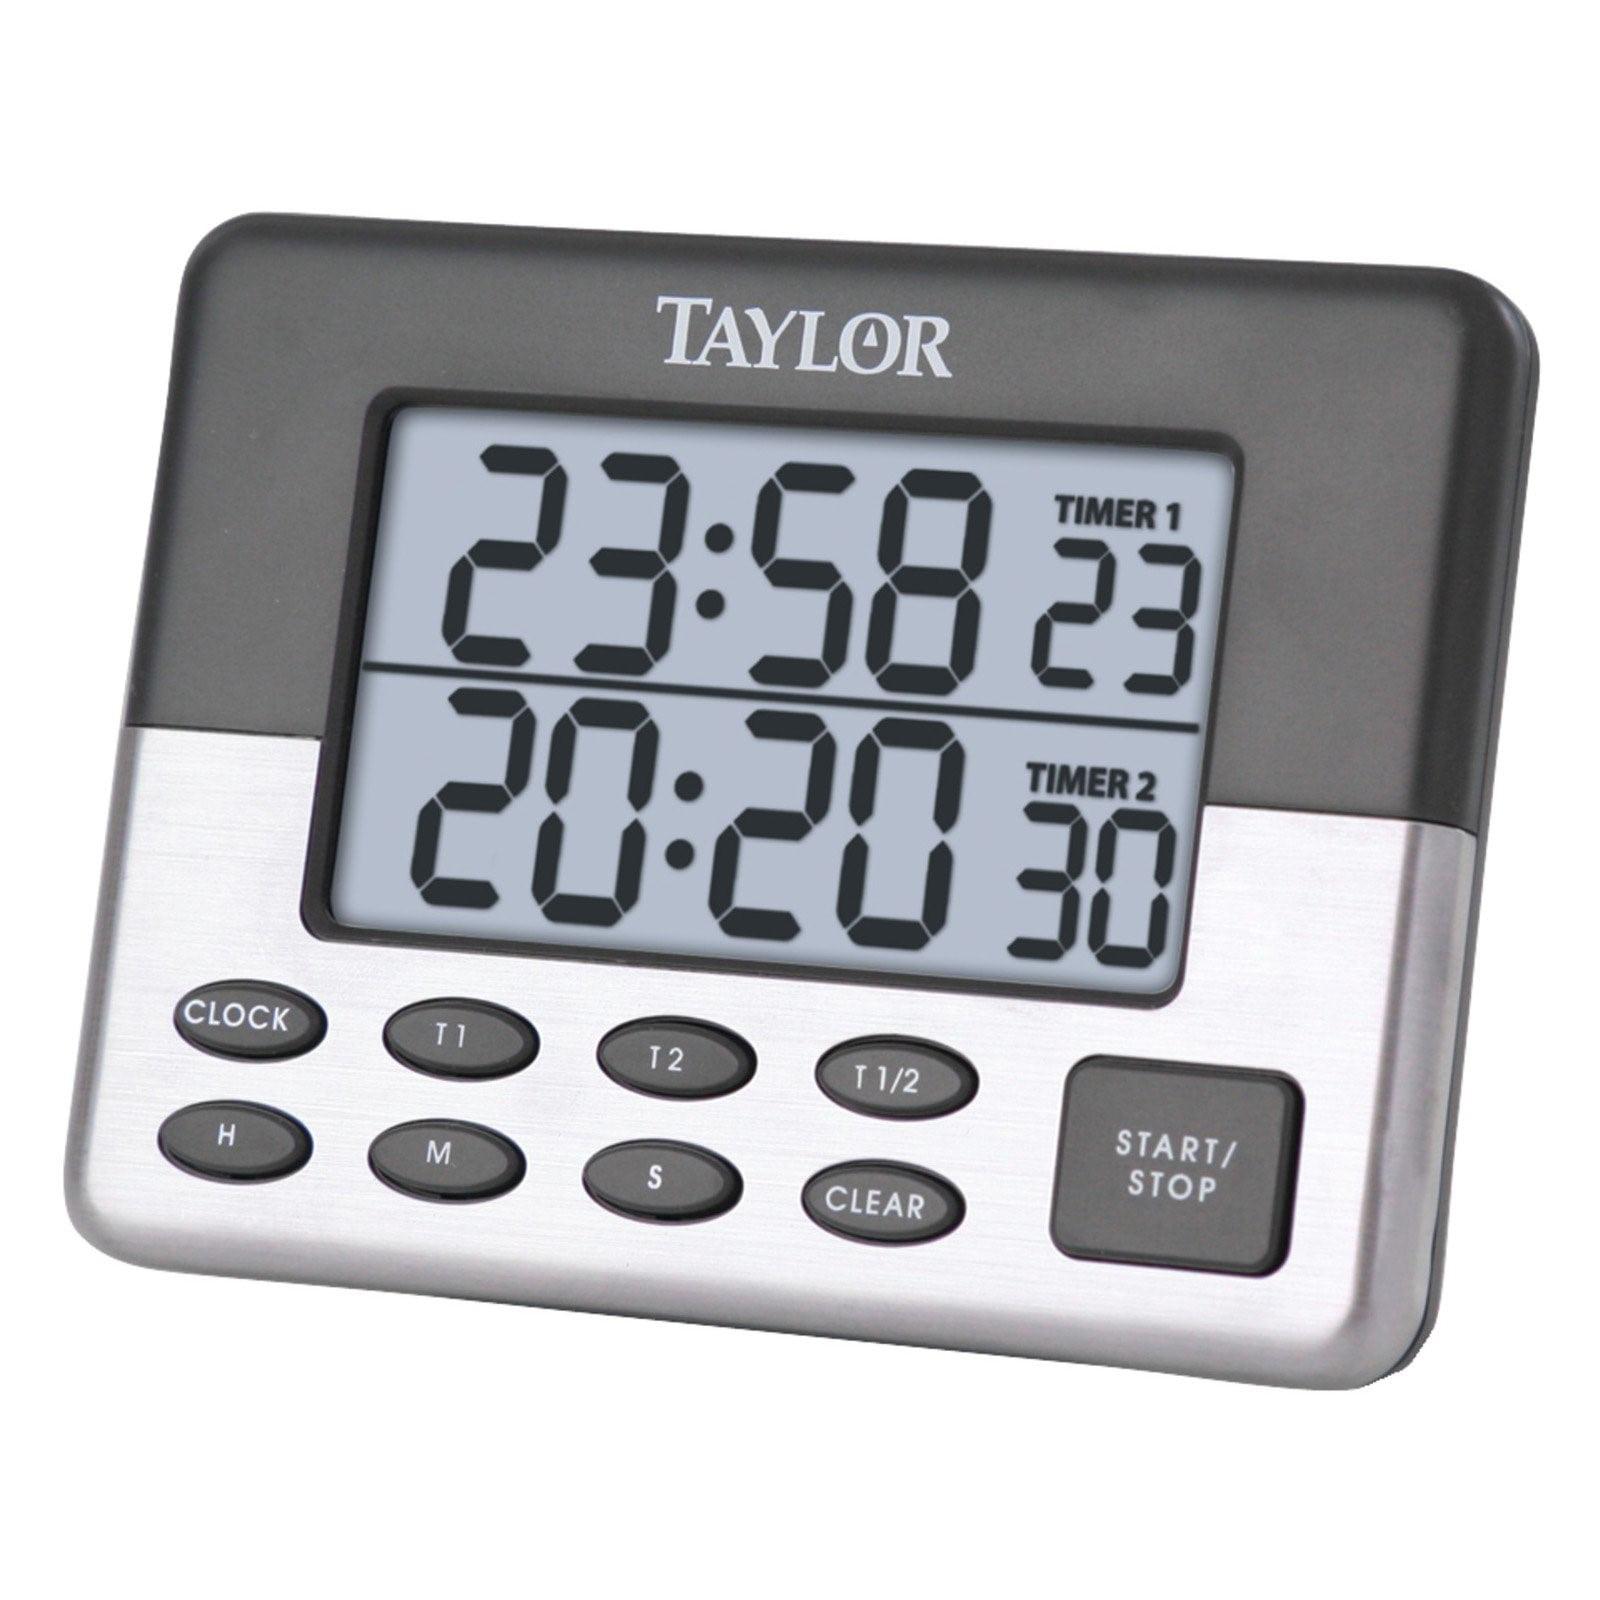 Taylor 5872-9 Dual Event Digital Timer - Walmart.com